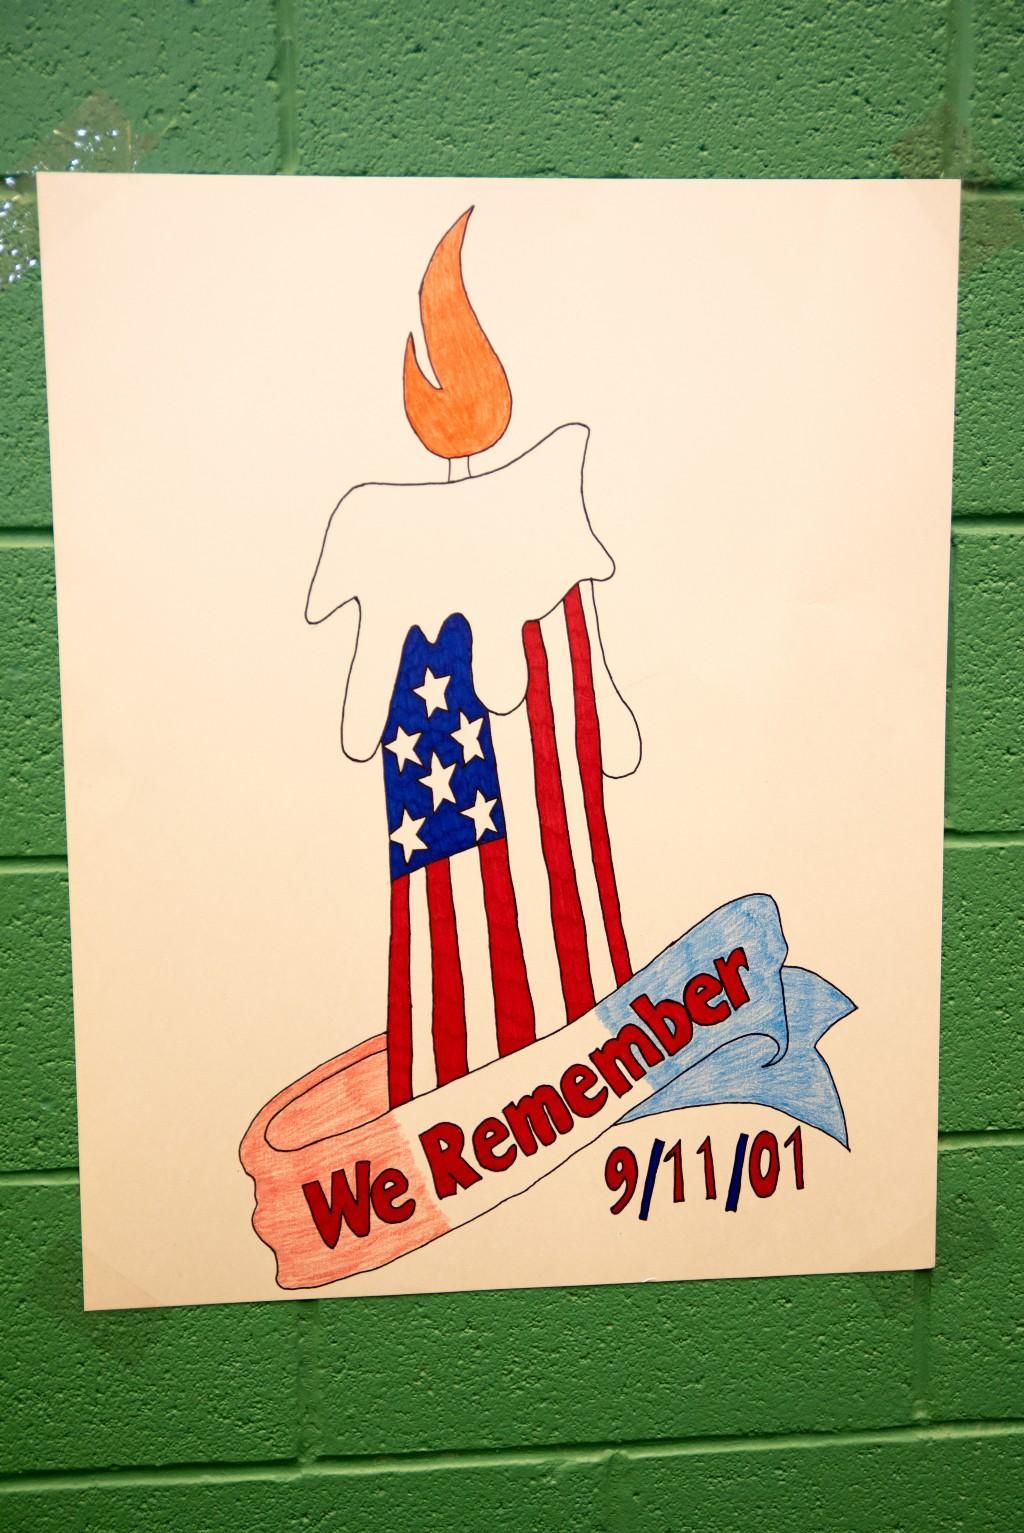 9/11 Event